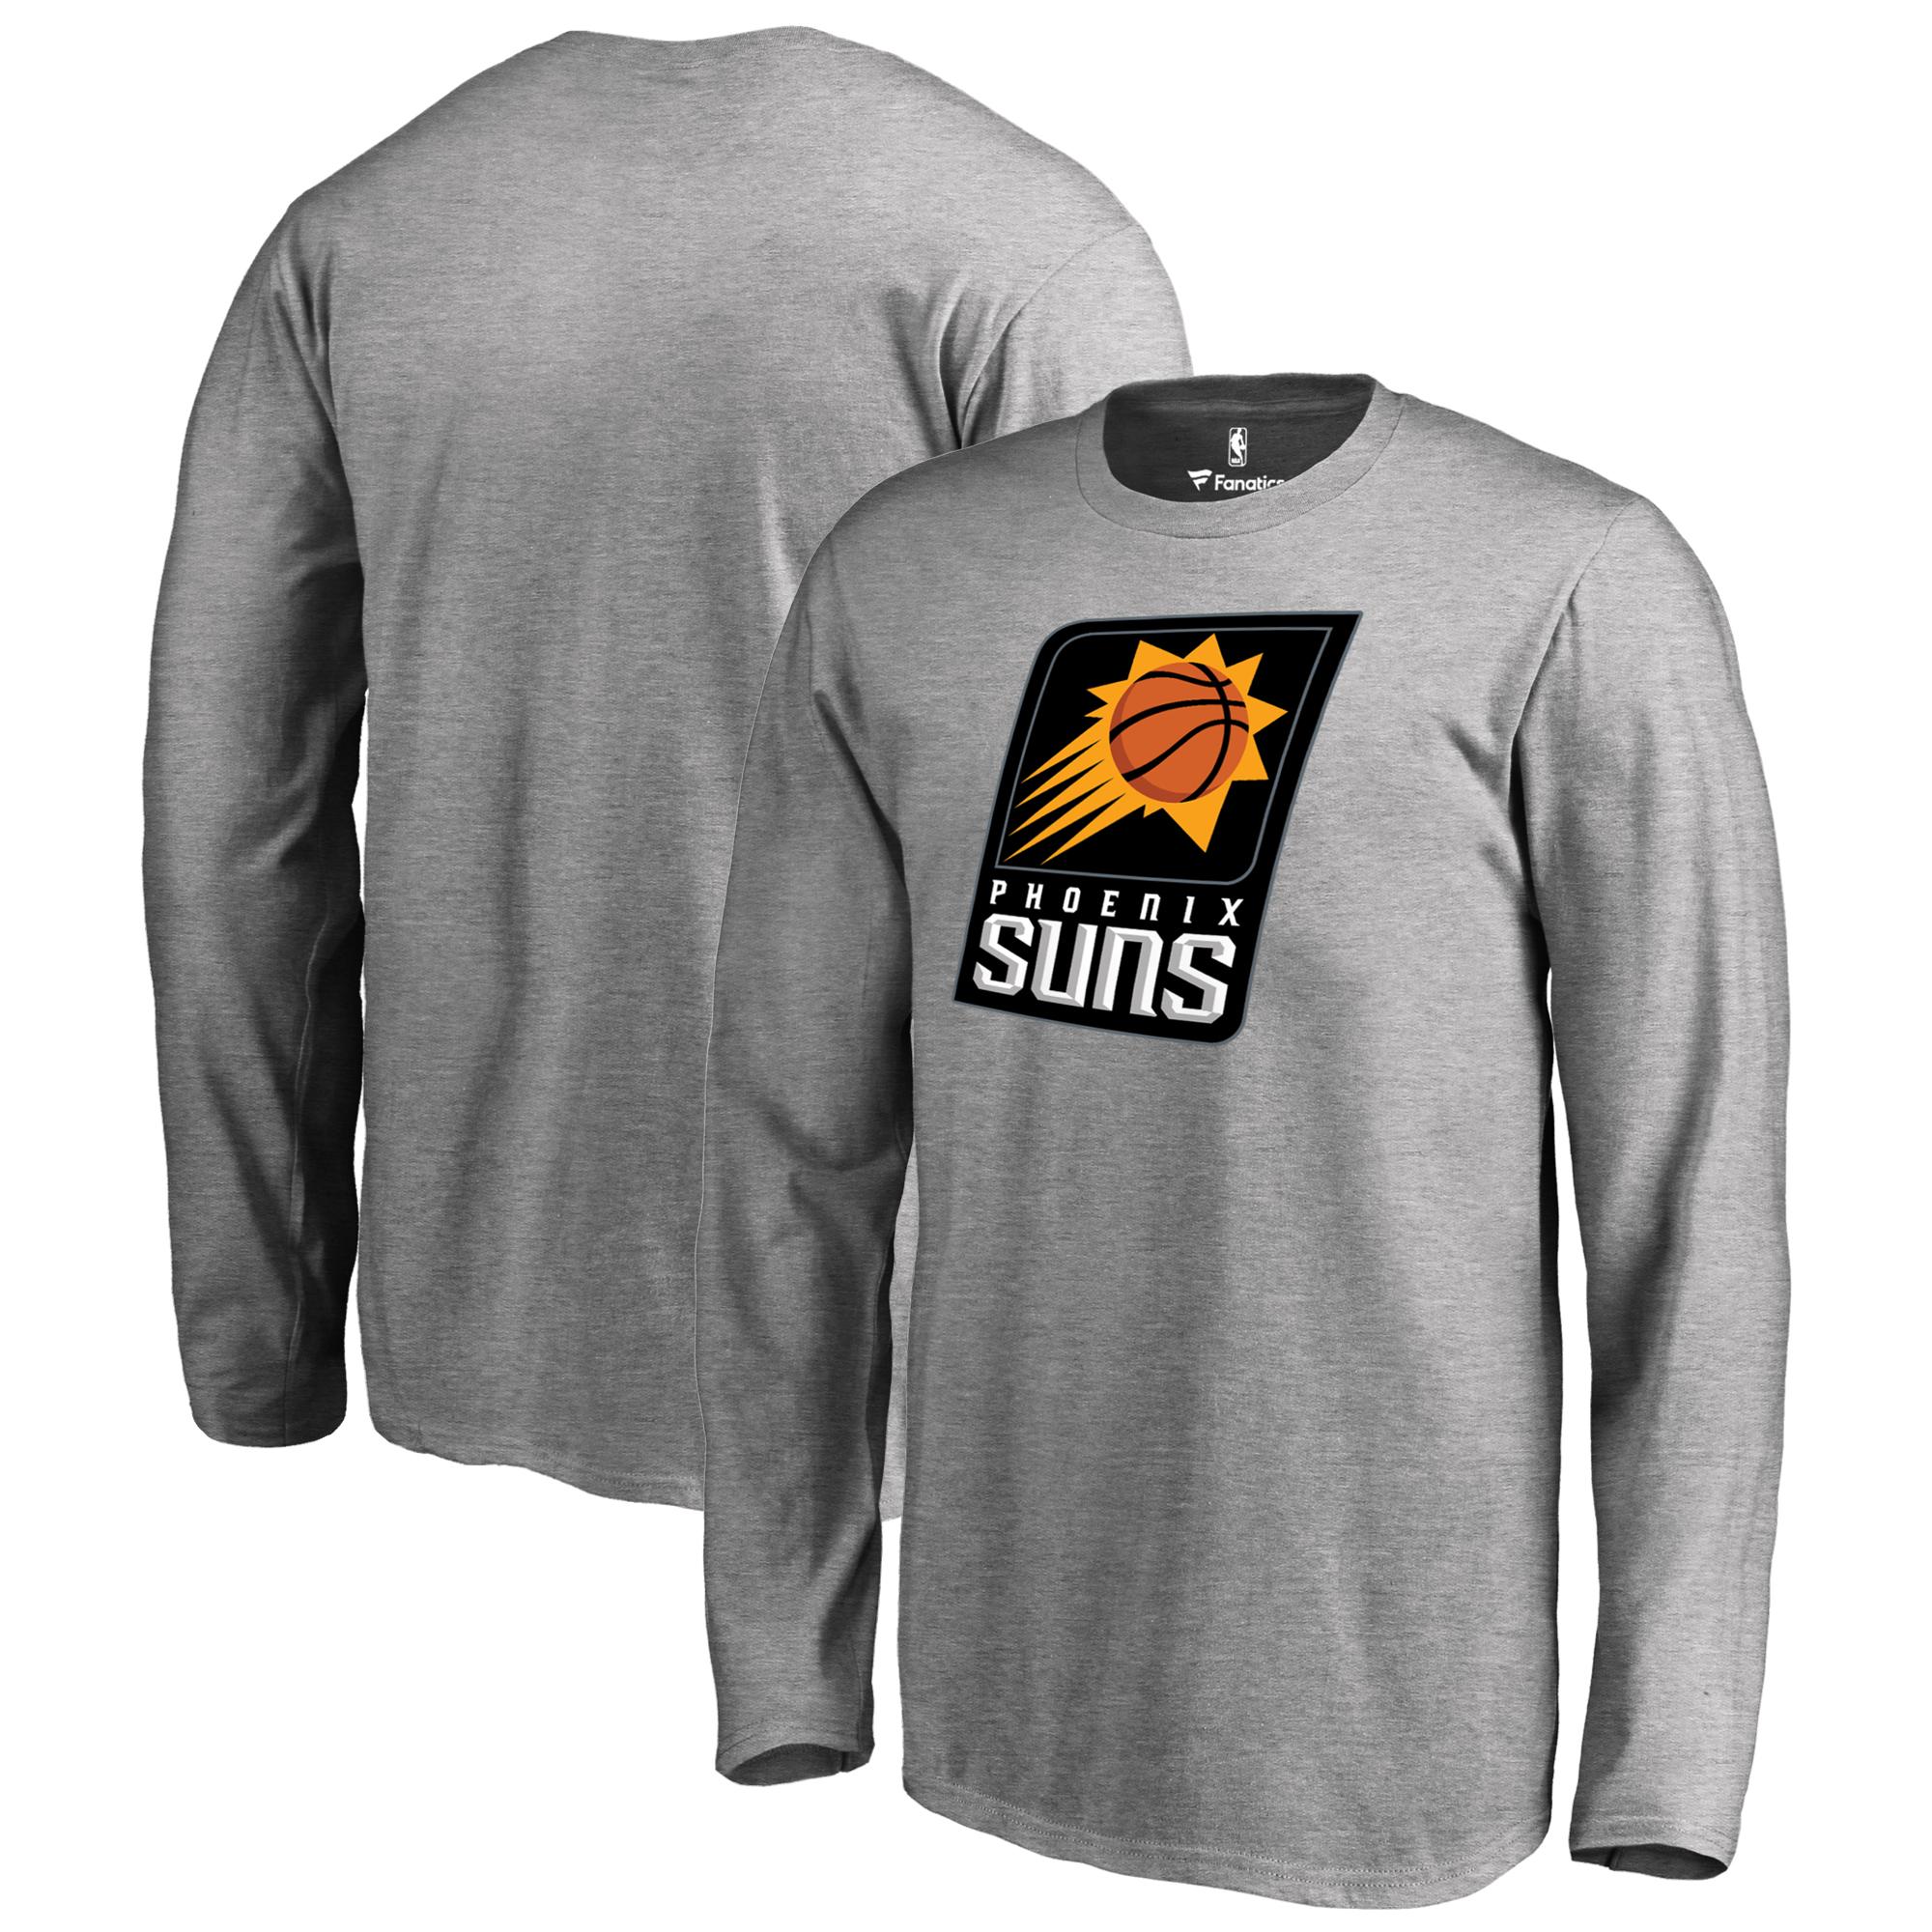 Phoenix Suns Fanatics Branded Youth Primary Logo Long Sleeve T-Shirt - Heathered Gray